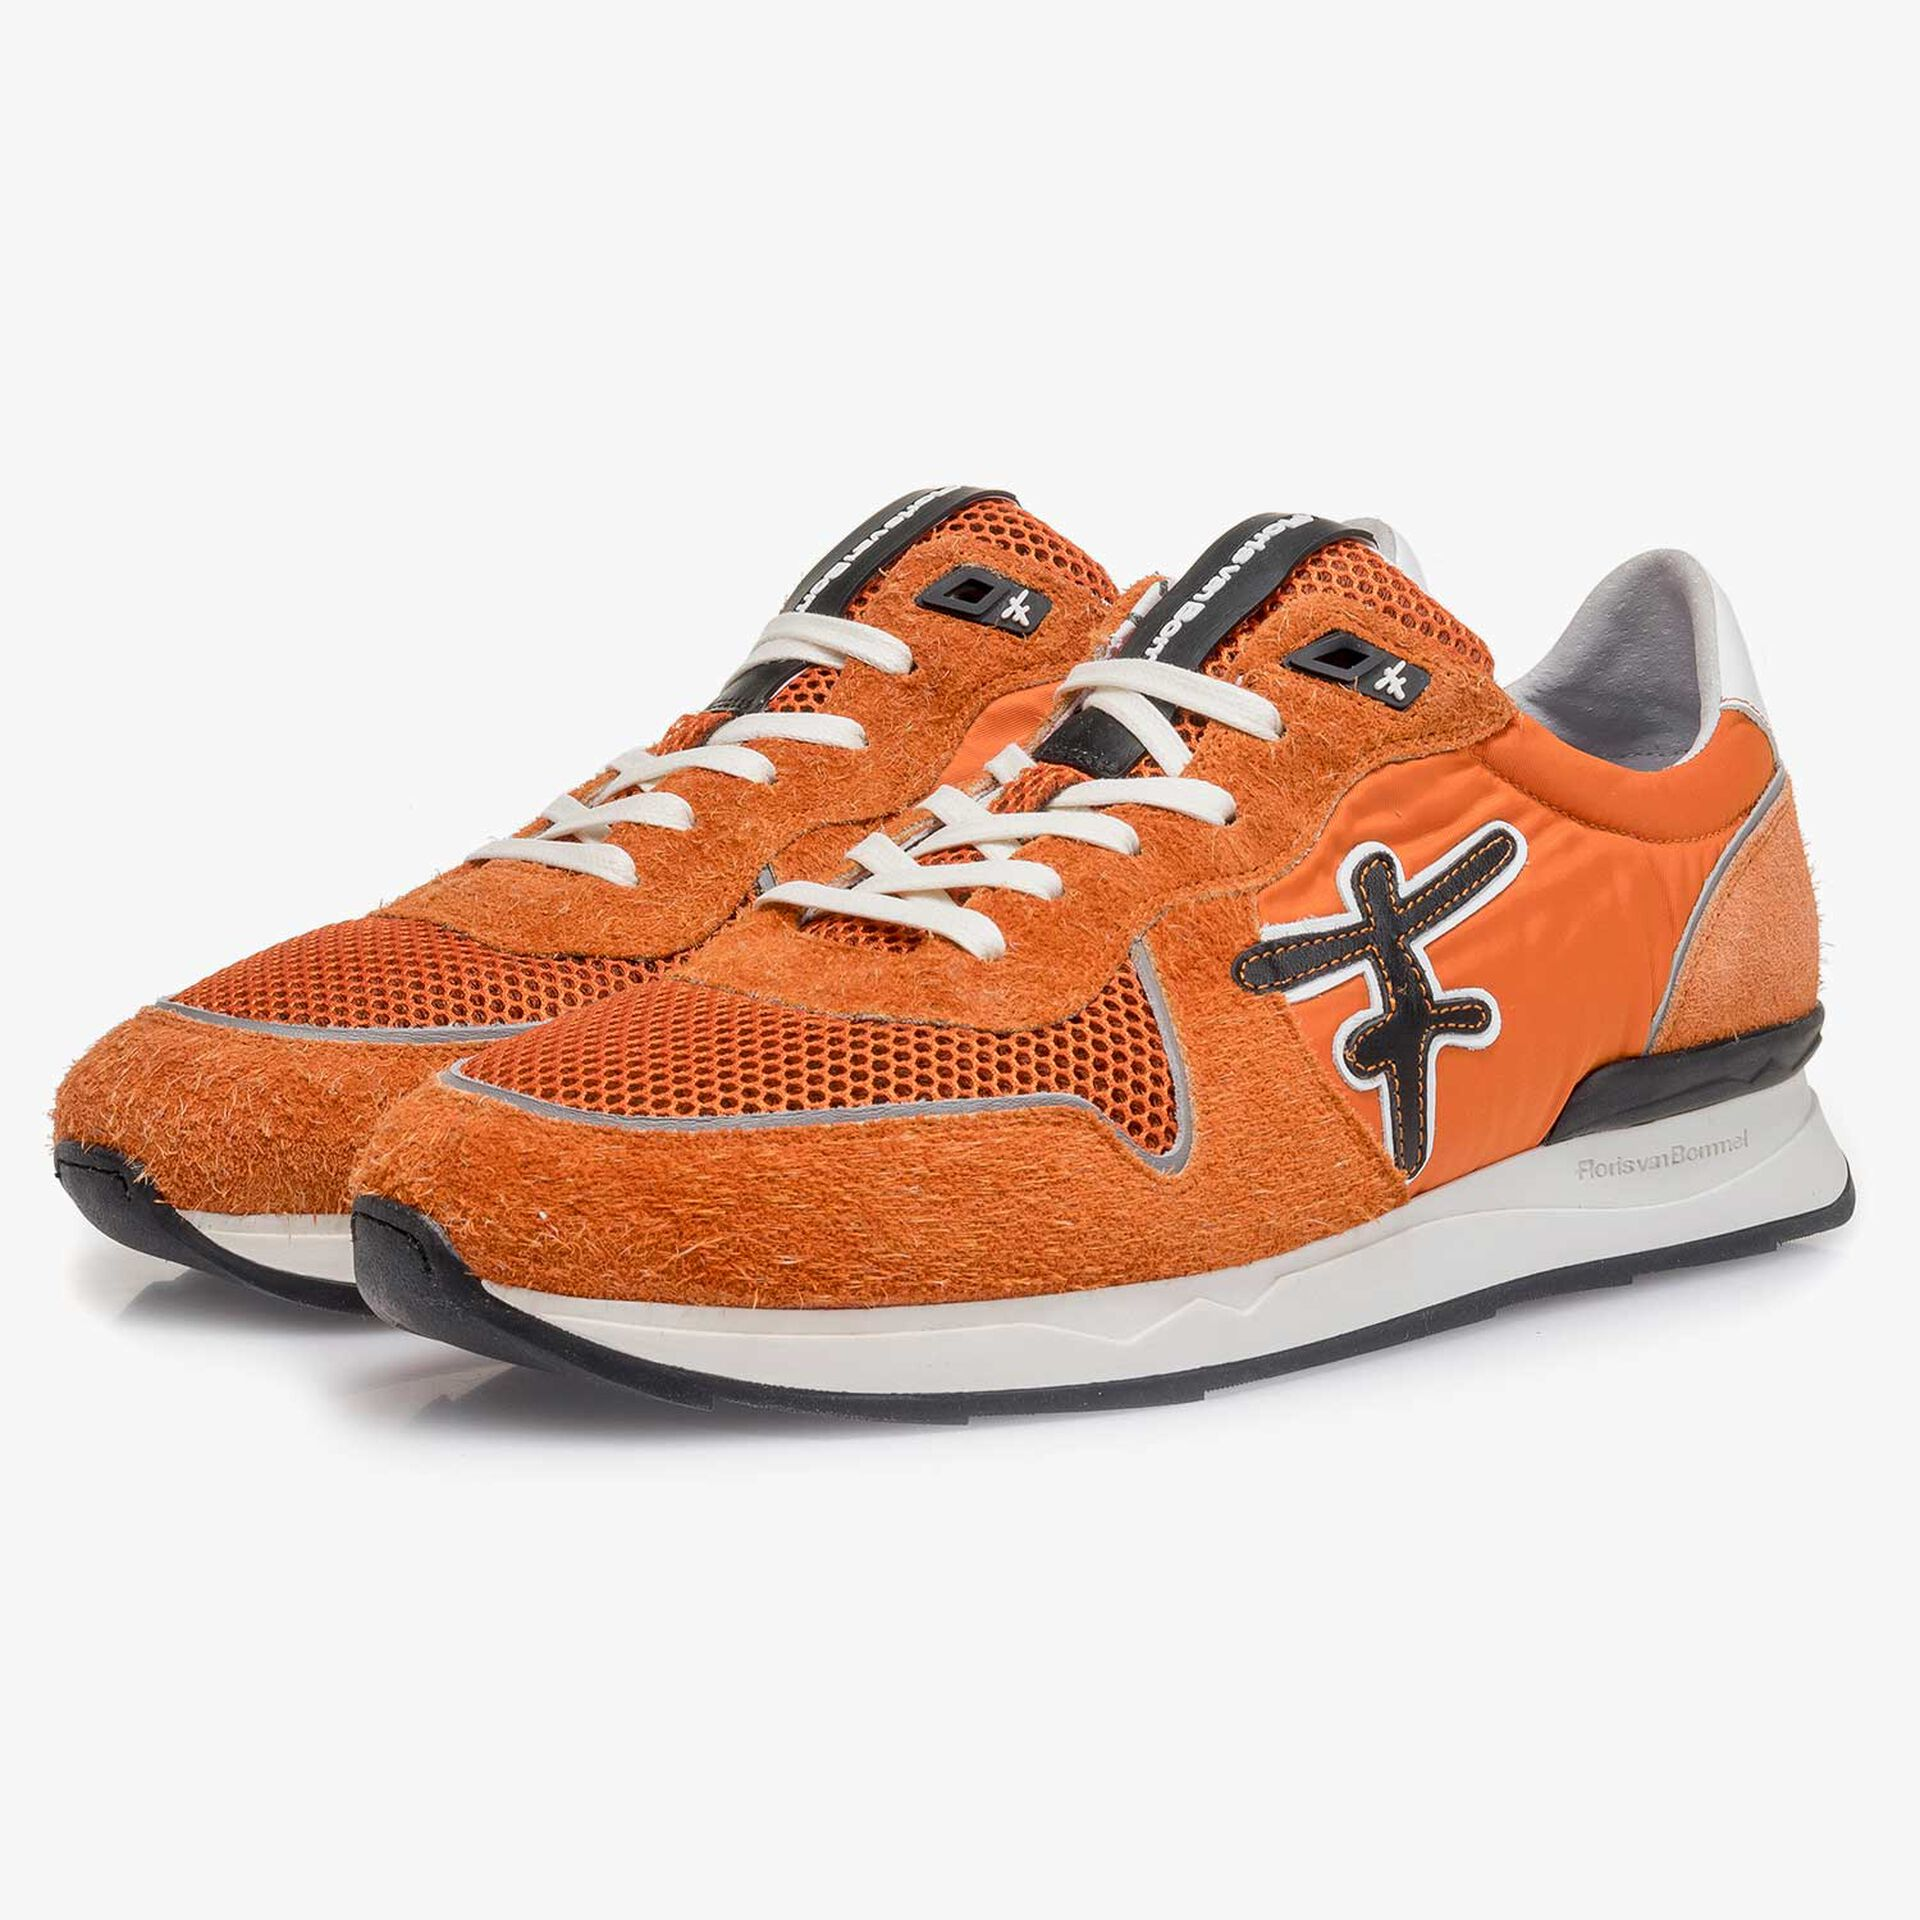 Orange-black suede leather sneaker